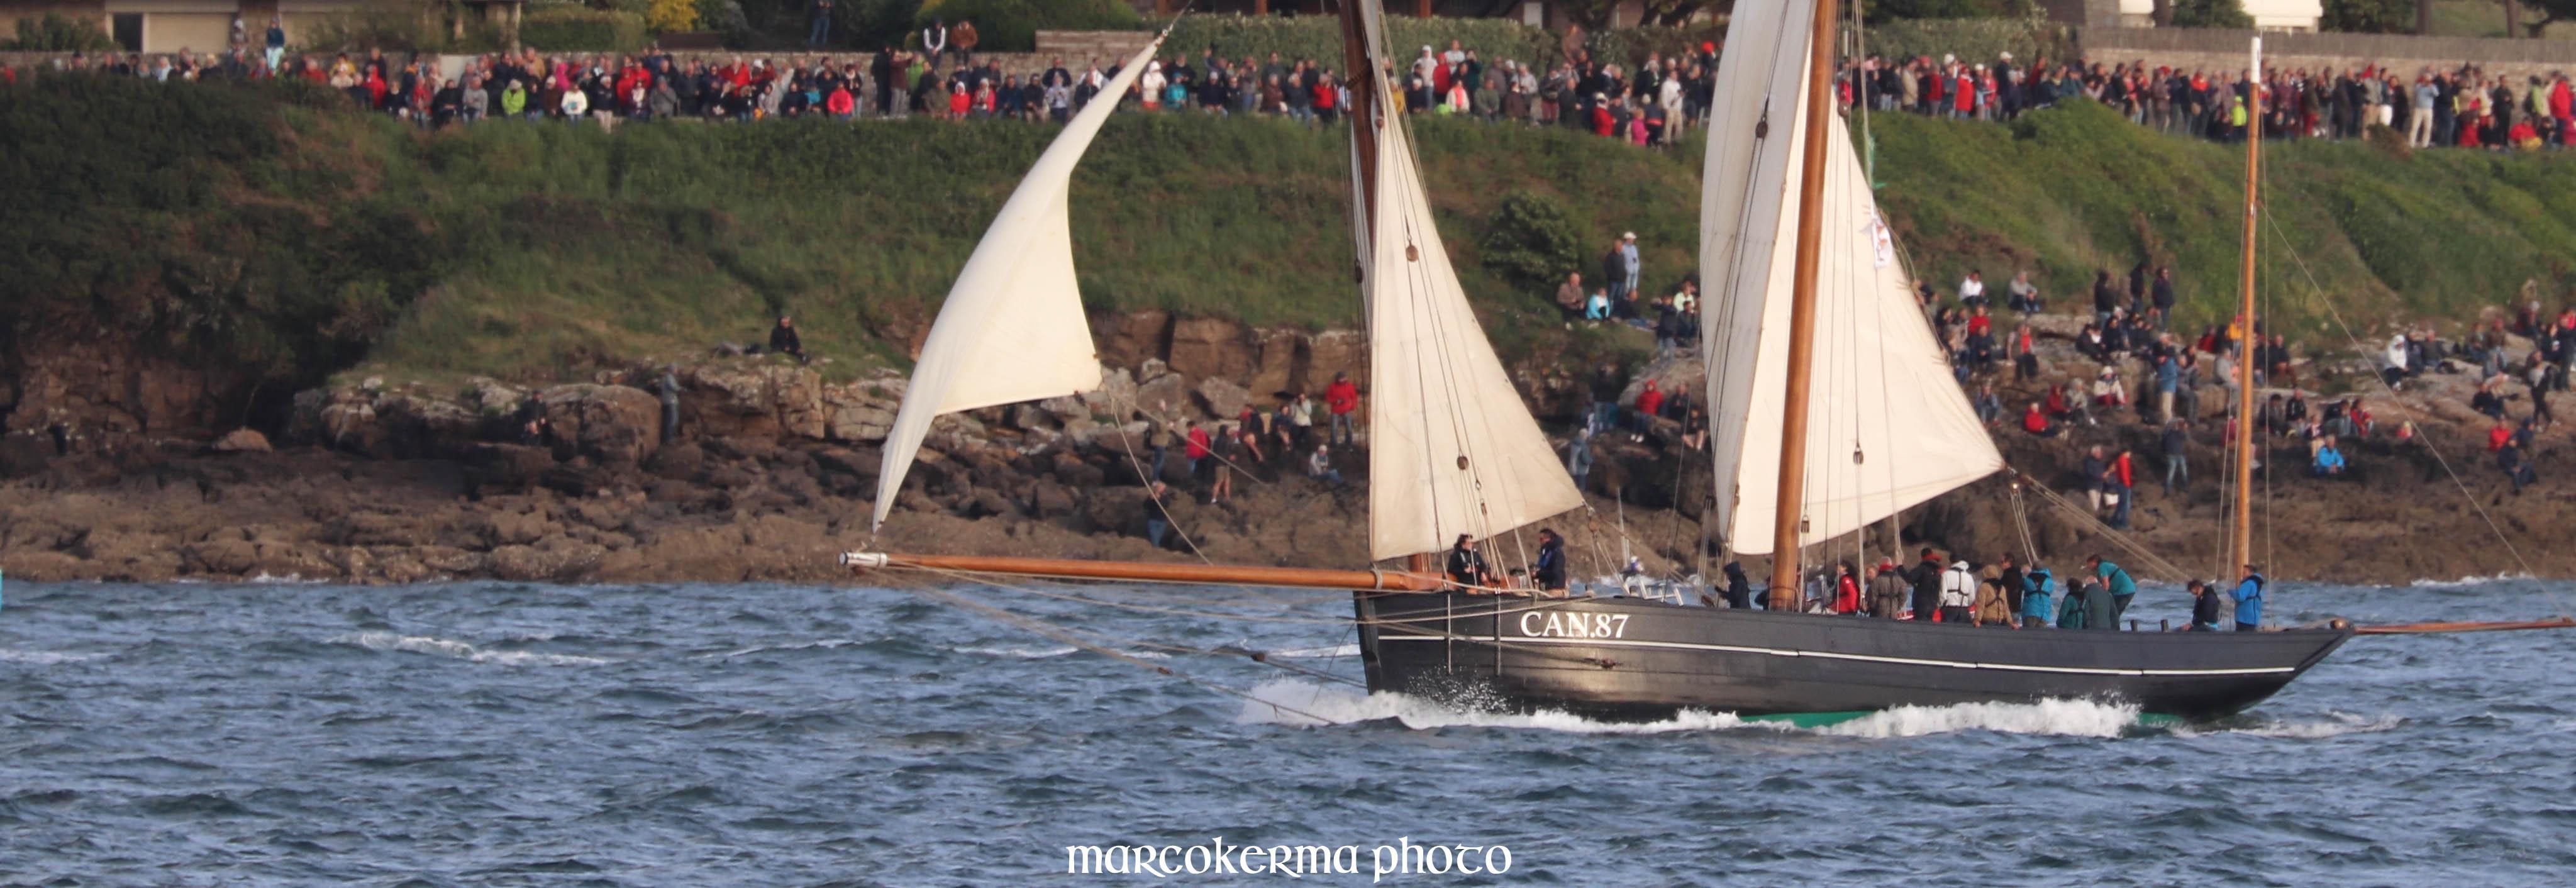 la Cancalaise  27-5-19 Port-Navalo 20h27.jpg